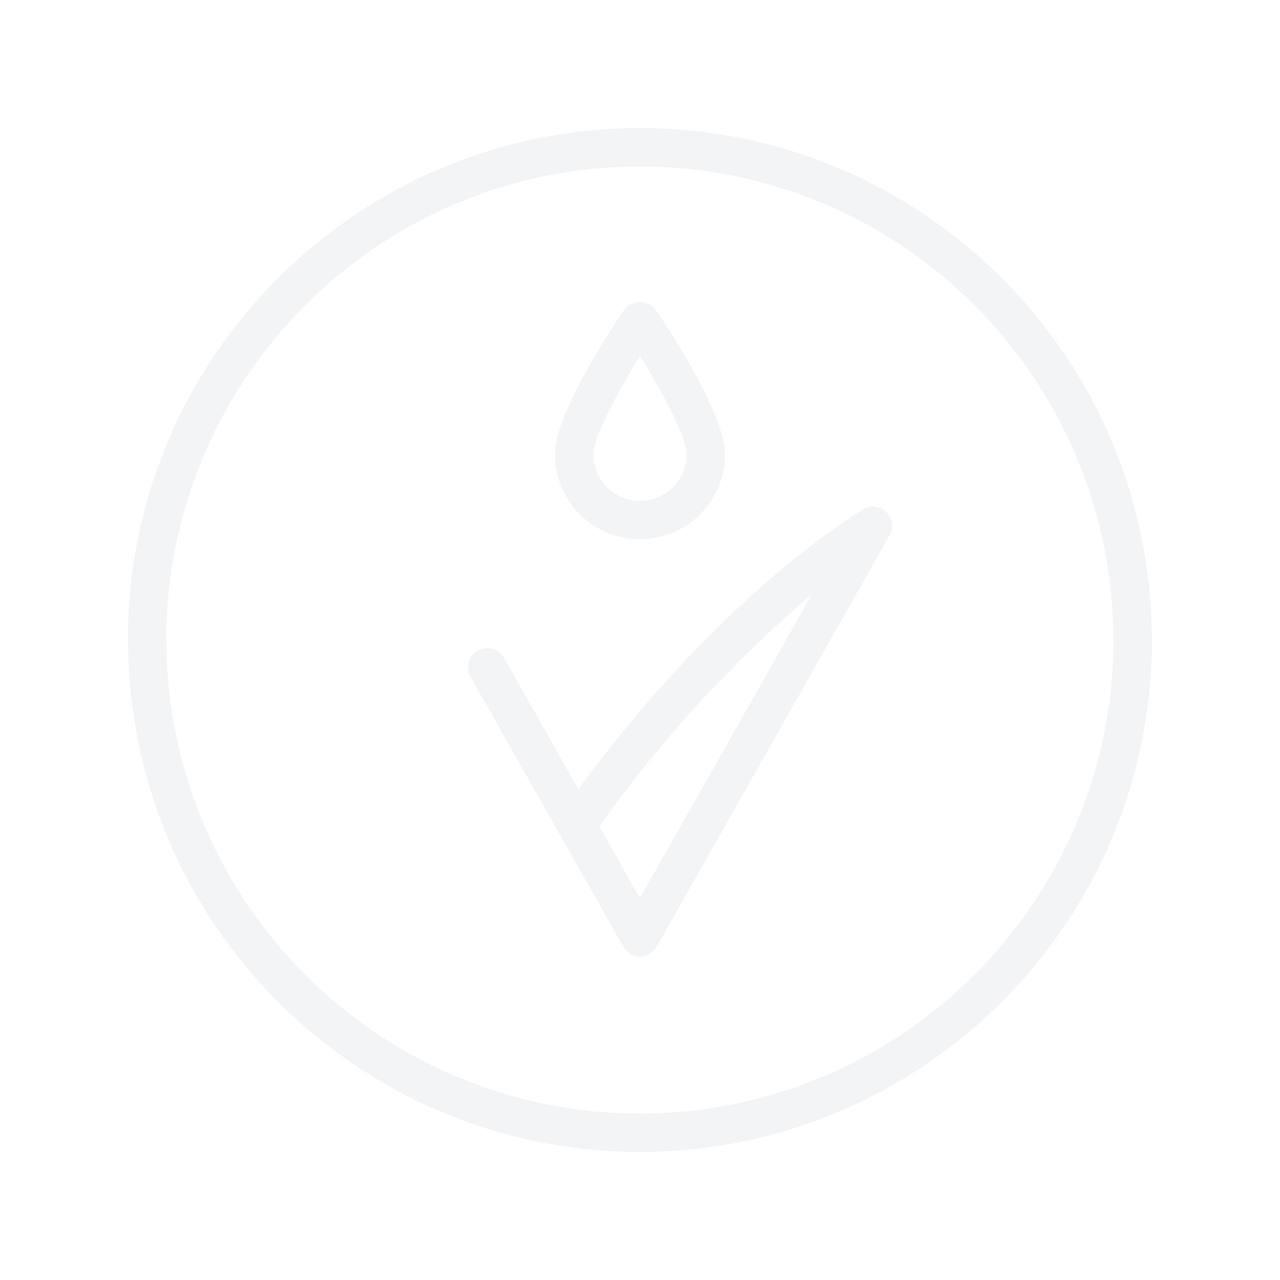 Lily Lolo Natural Eye Pencil Black 1.2g